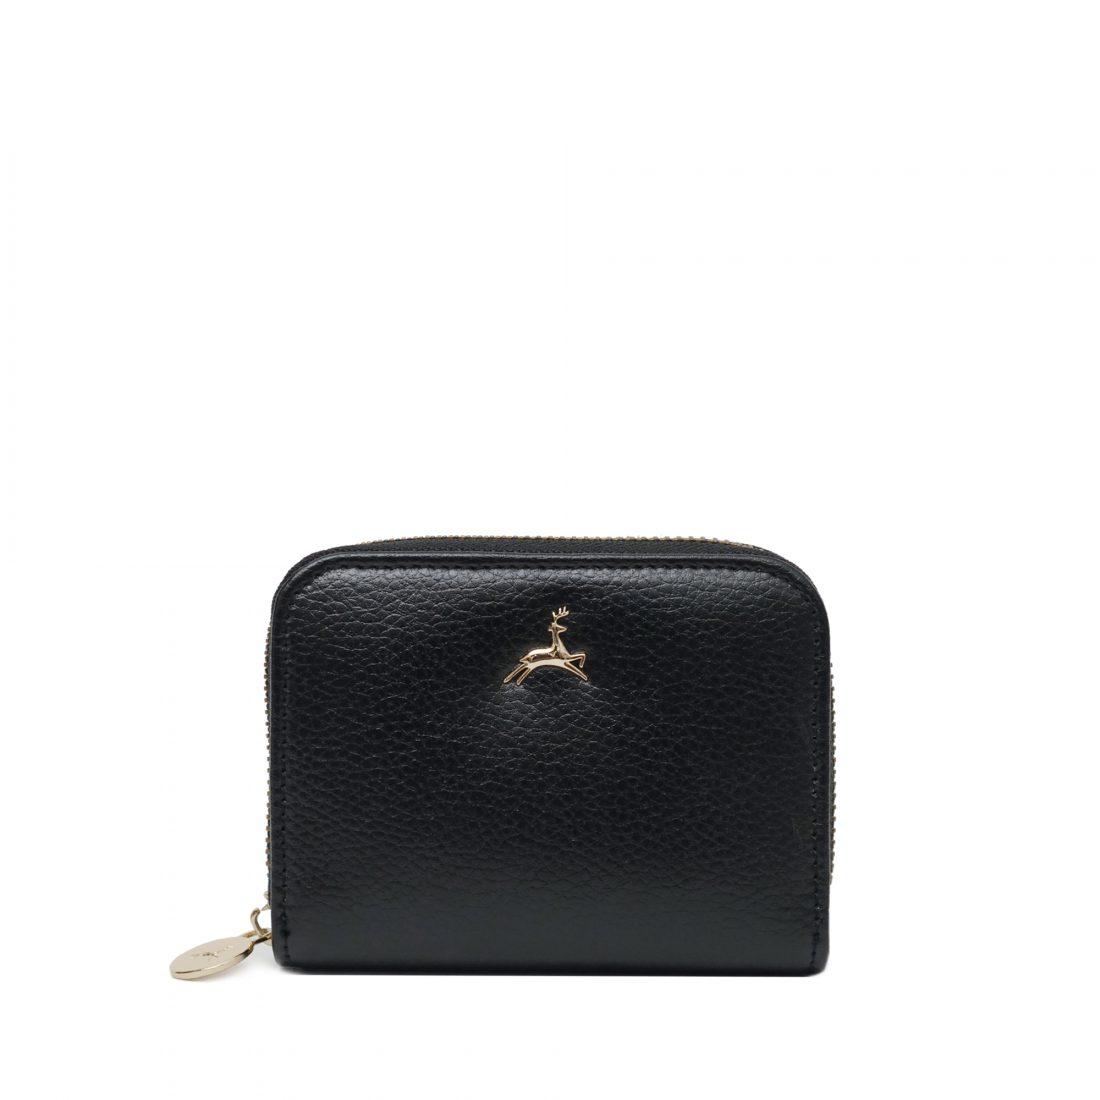 akordia-wallet-black-1